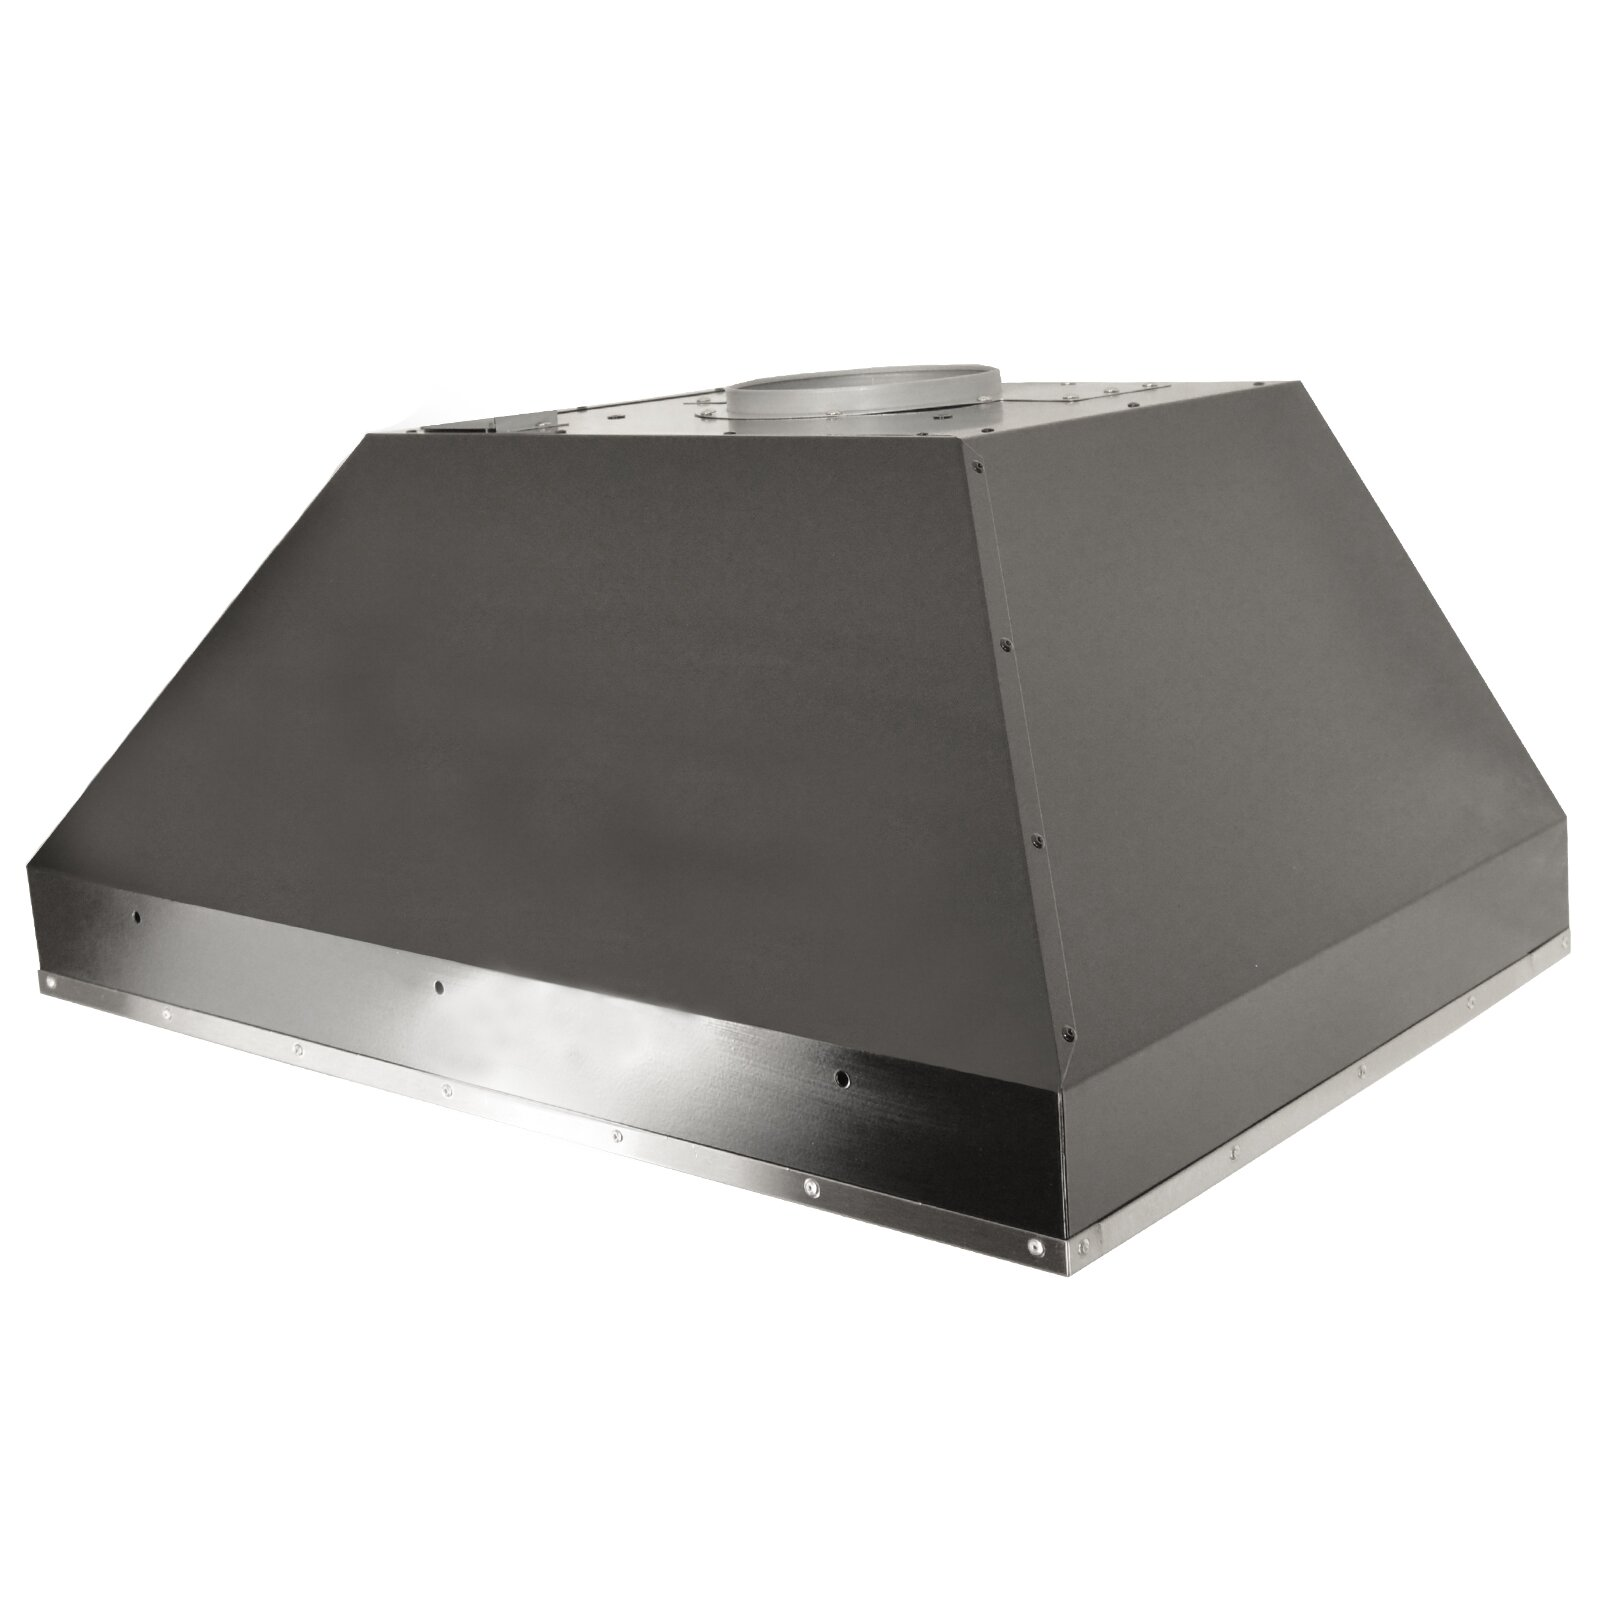 kobe range hoods premium 30 750 cfm ducted under cabinet range hood wayfair. Black Bedroom Furniture Sets. Home Design Ideas